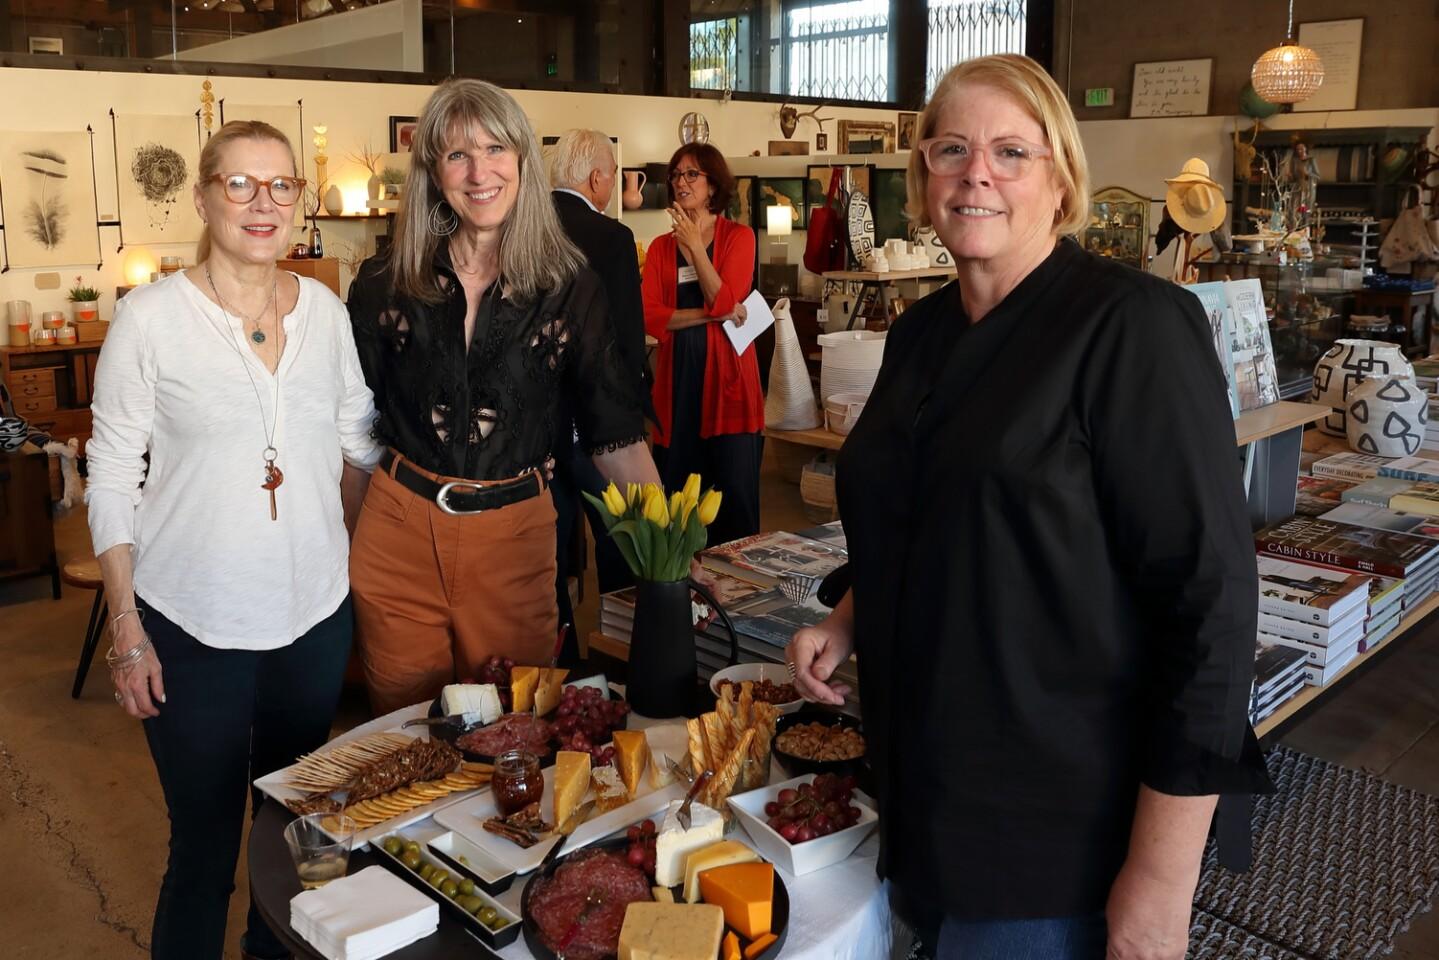 Carole Carden (owner, SoLo), Sooz Noll, Lori Graham